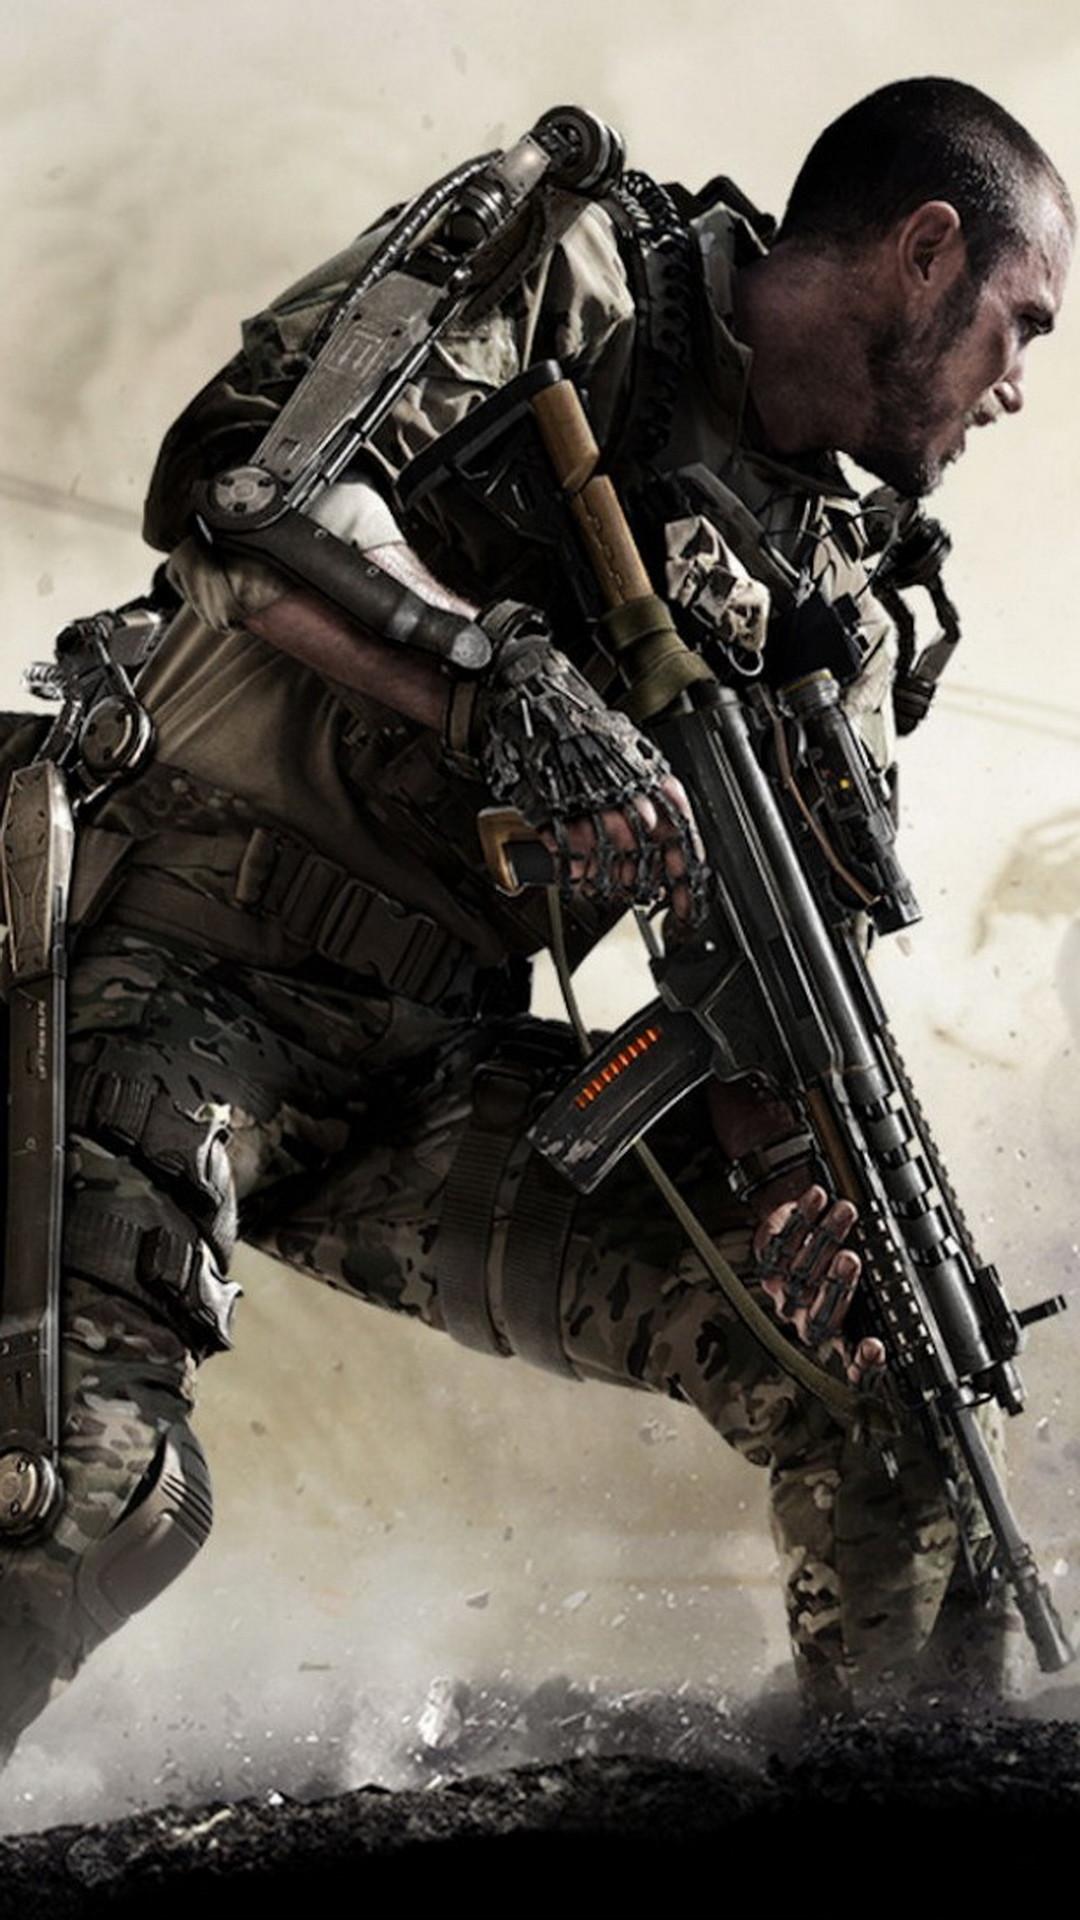 For Geeks Call of Duty Advanced Warfare